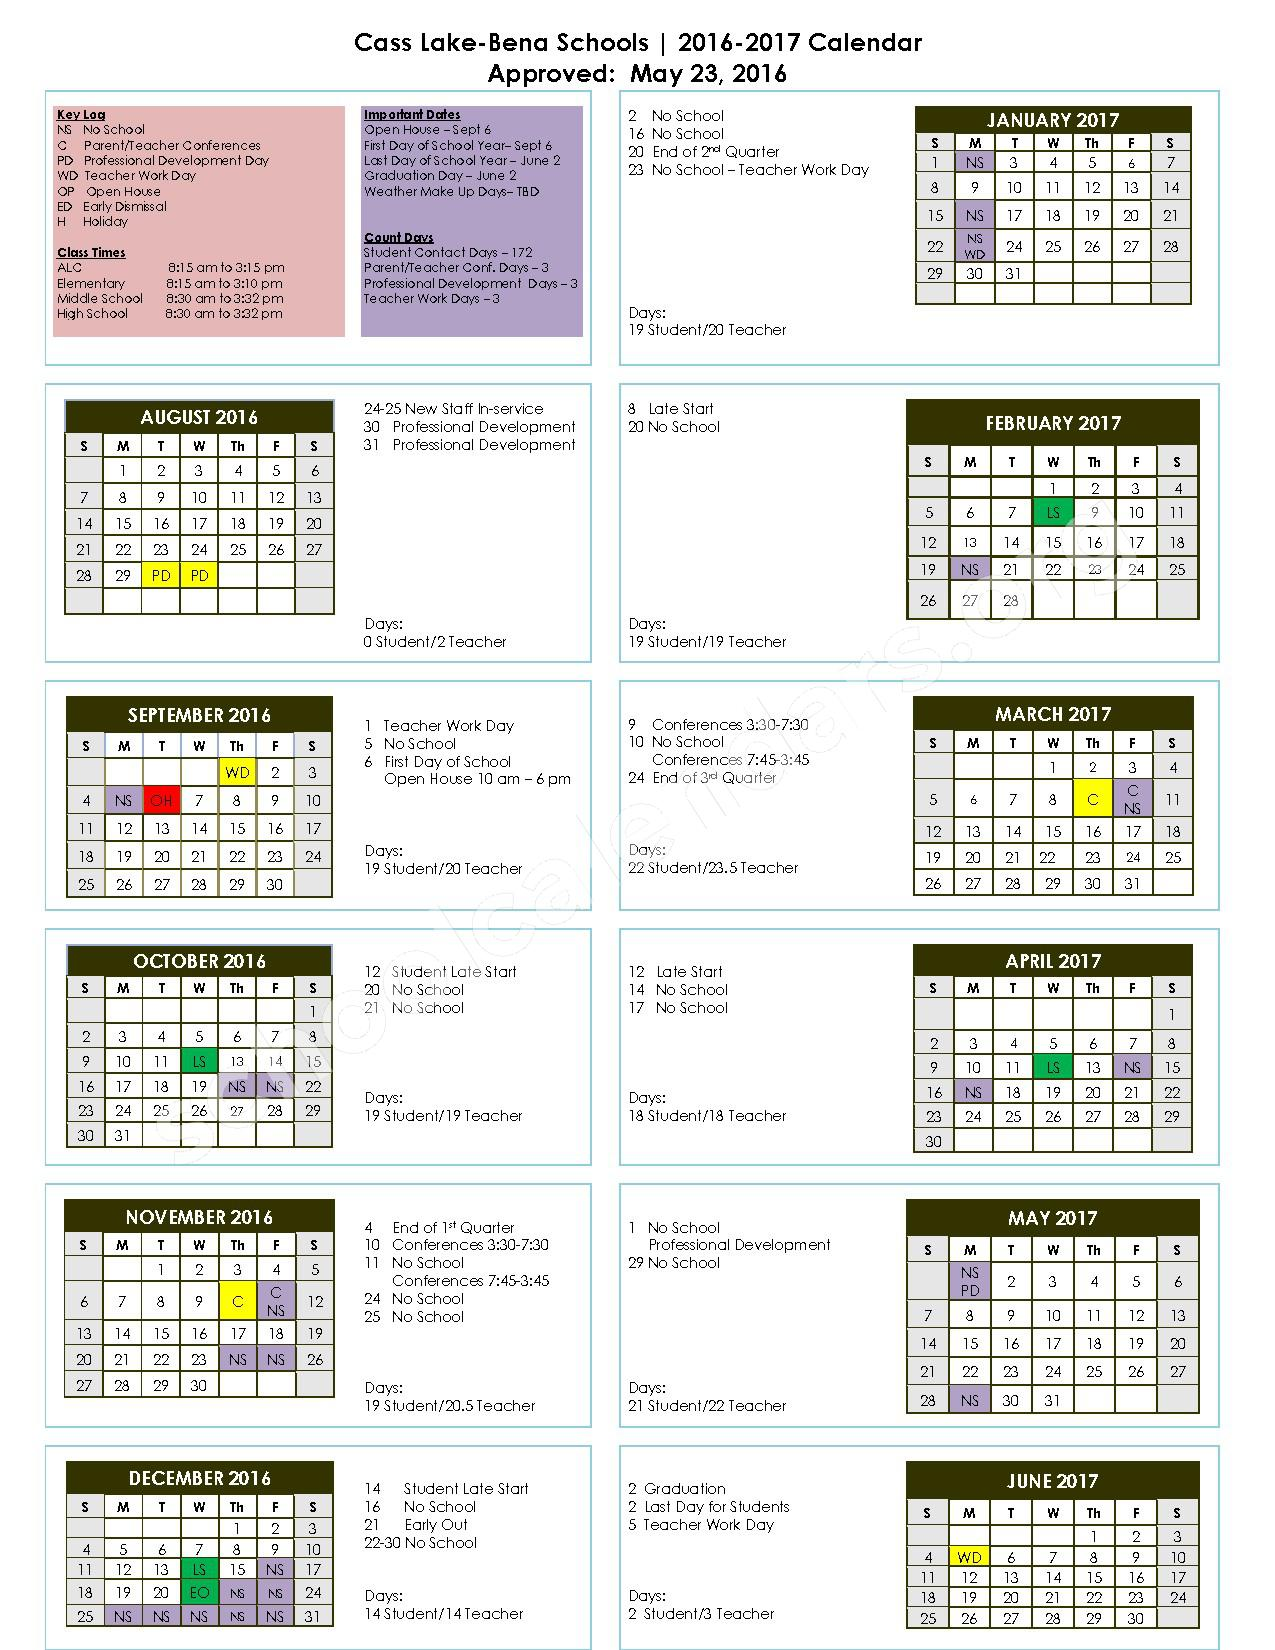 2016 - 2017 School Calendar – Cass Lake-Bena Elementary School – page 1